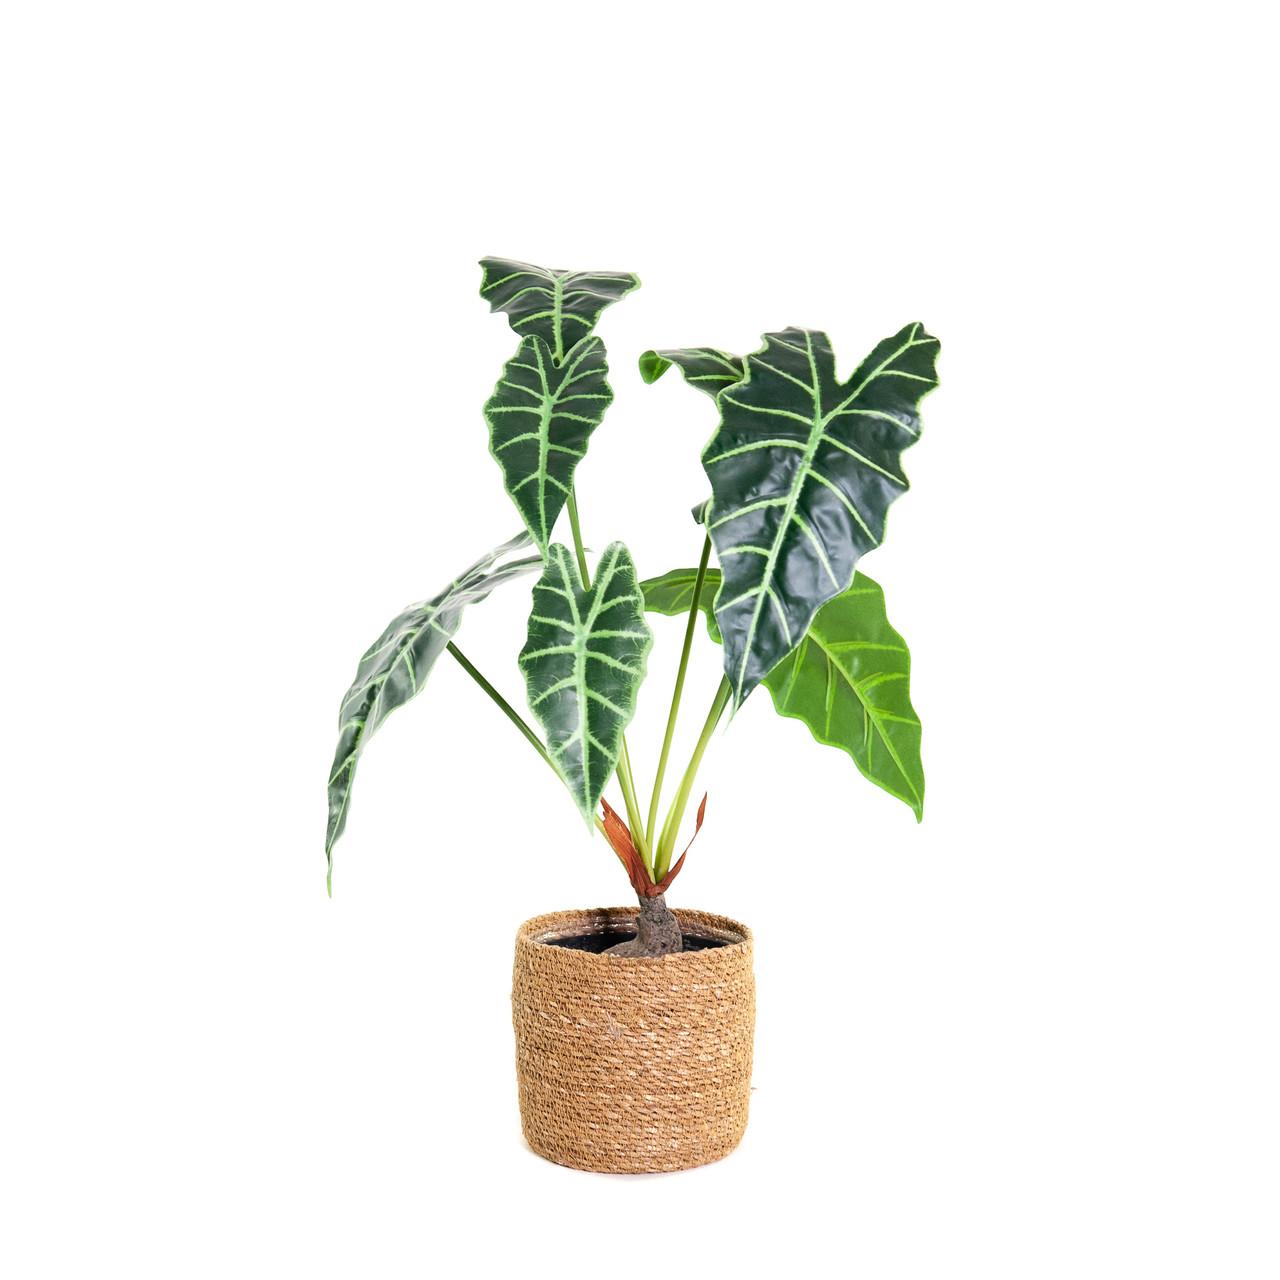 Kunst Alocasia Polly (skeletplant) 60 cm